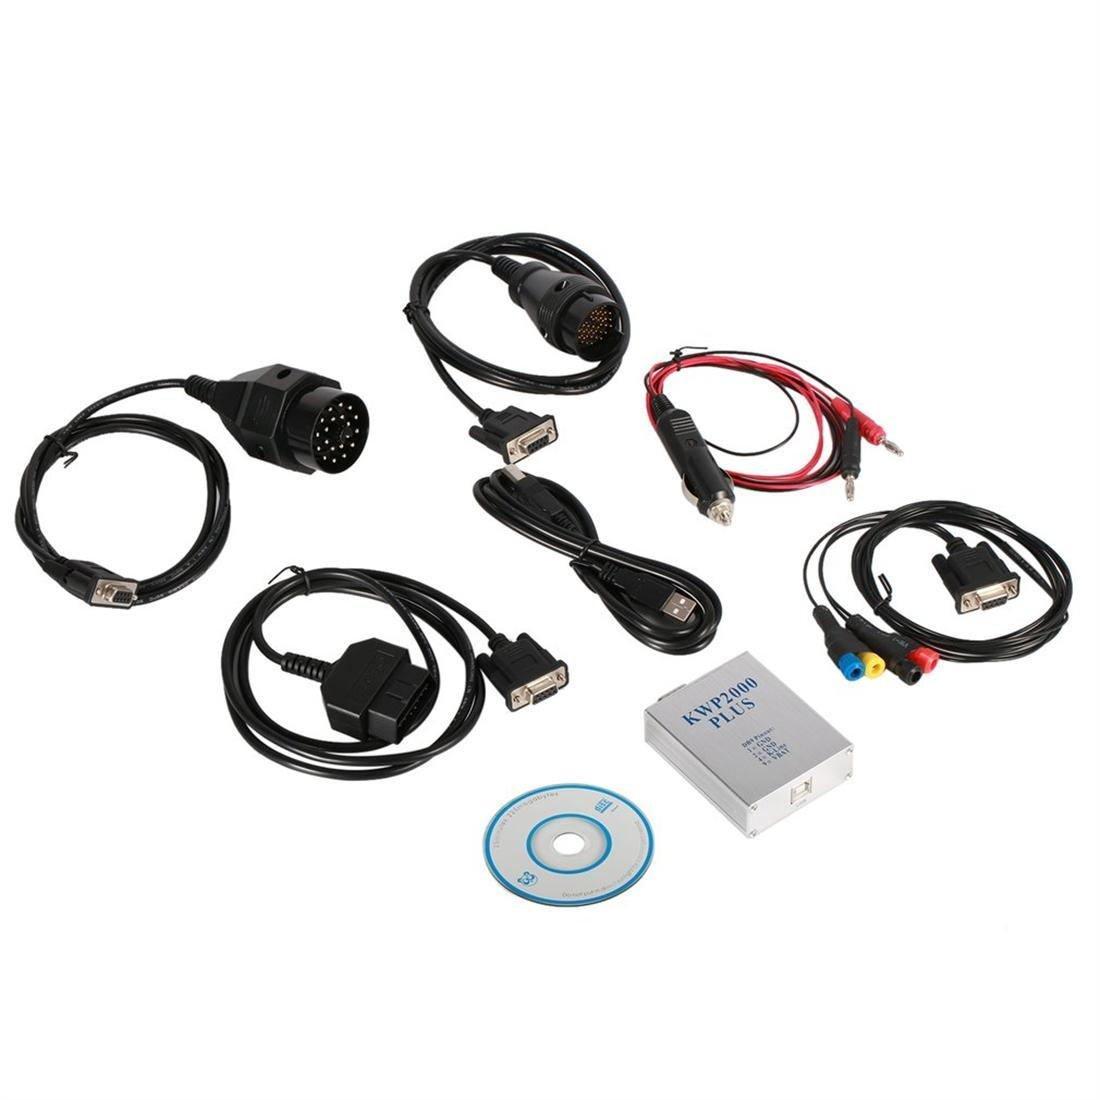 KWP2000 Plus Car Engine Diagnostic Tools OBDII OBD2 ECU Chip Tuning Tool